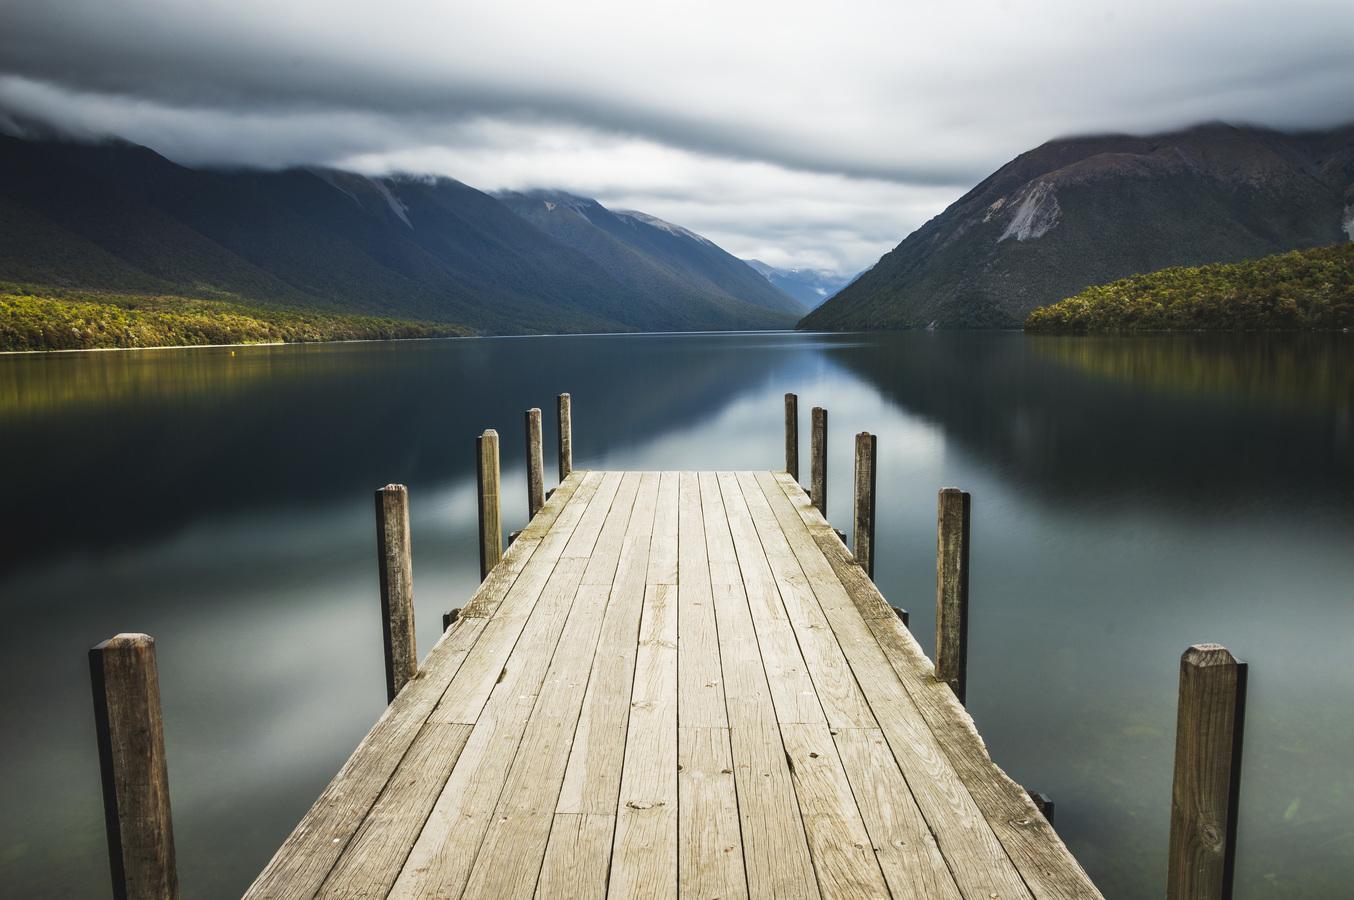 Rotoiti Lake